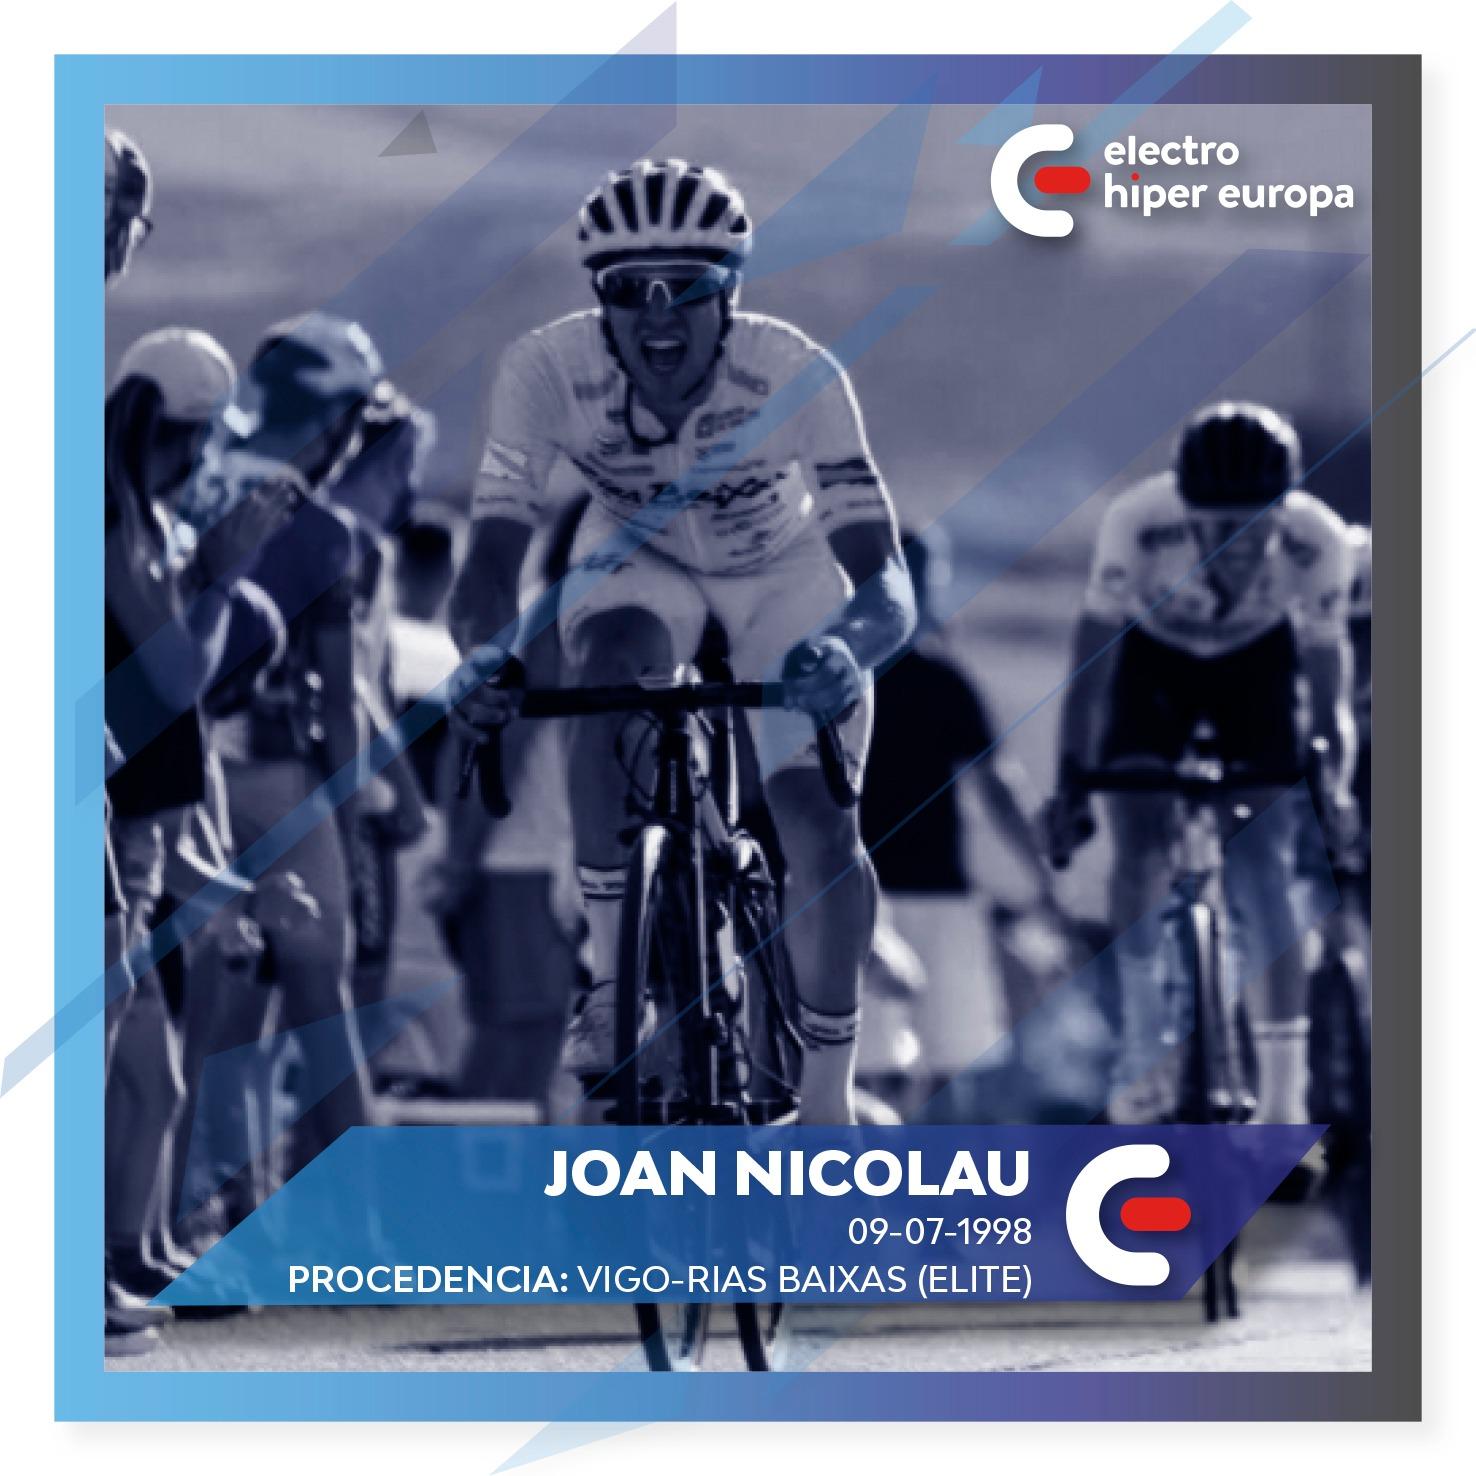 Joan Nicolau Electro Hiper Europa